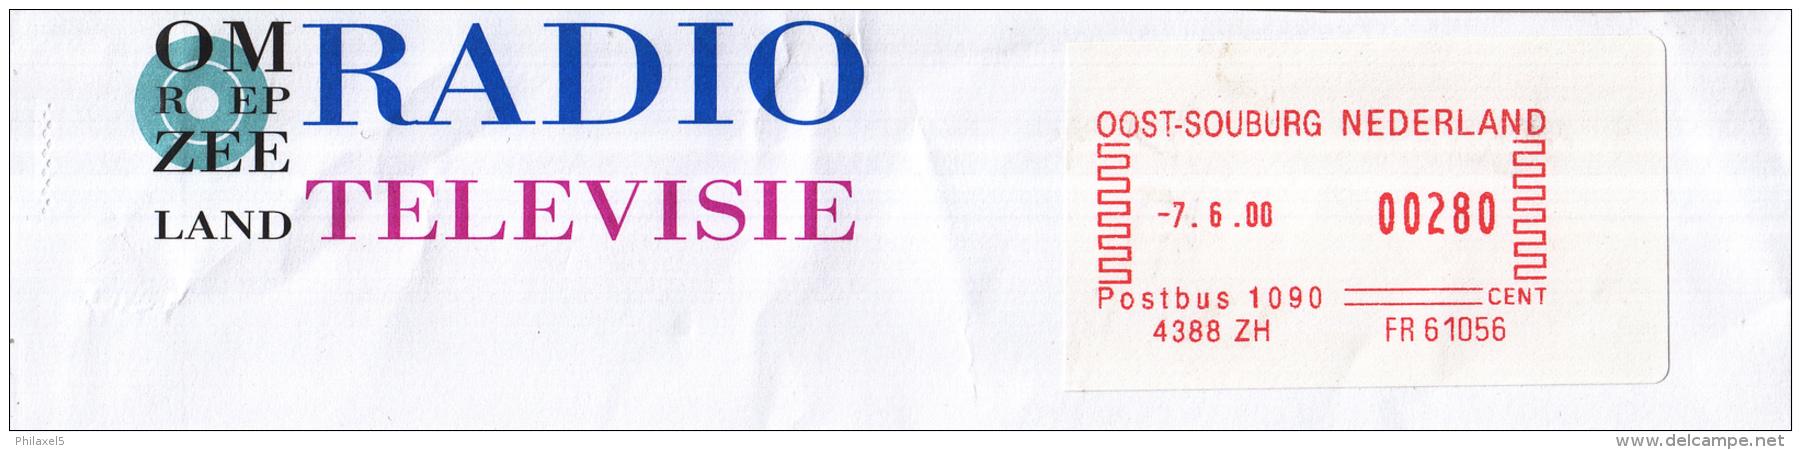 Nederland - Omroep Zeeland - Radio/Televisie - Oost-Souburg - Zeeland - Roodfrankering Op Fragment - Marcofilie - EMA (Print Machine)